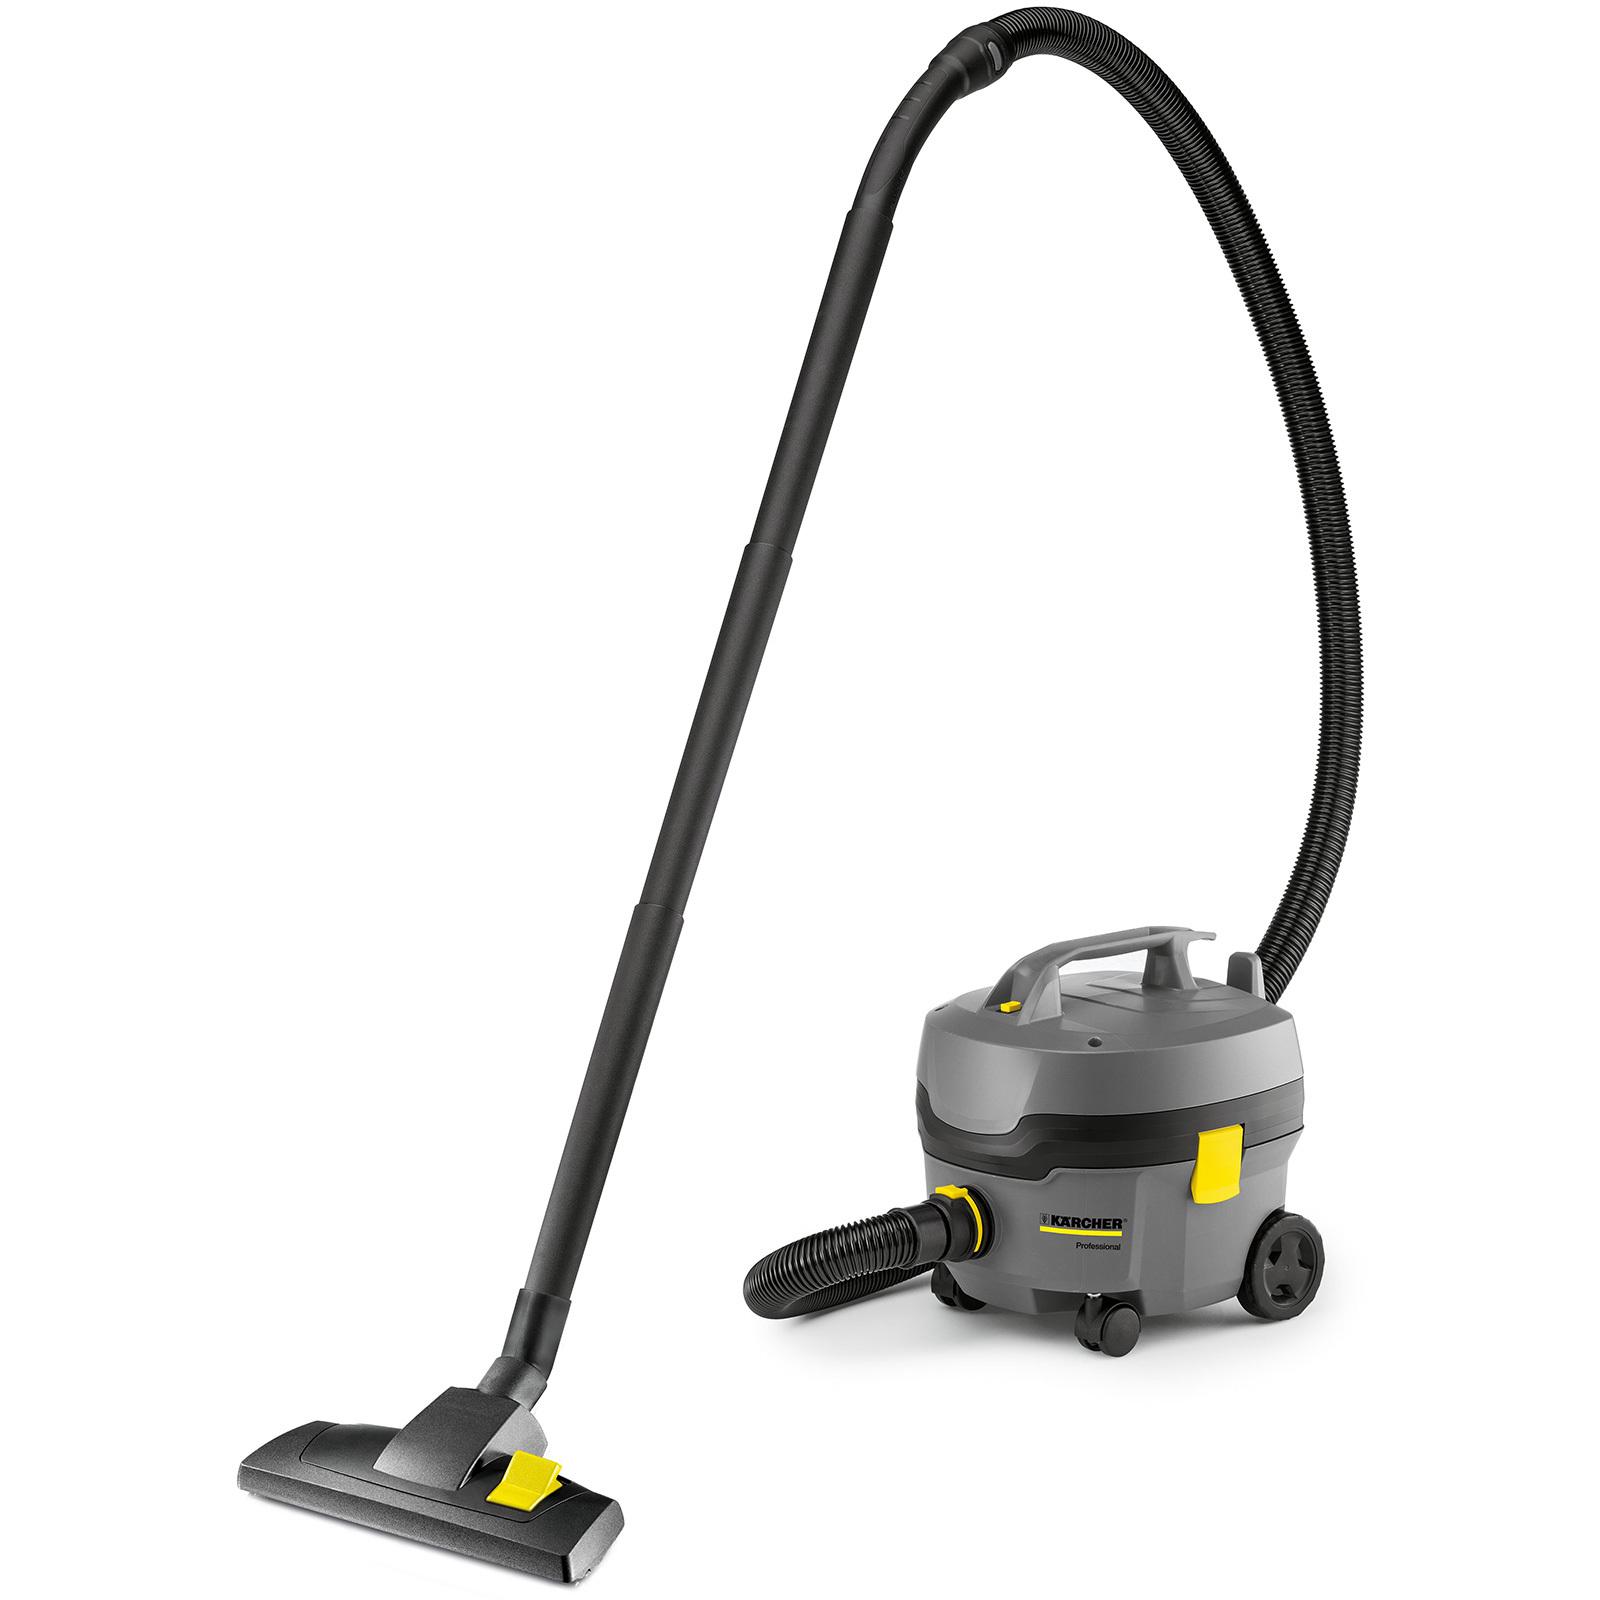 Karcher Professional T 7/1 Classic Dry Vacuum Cleaner